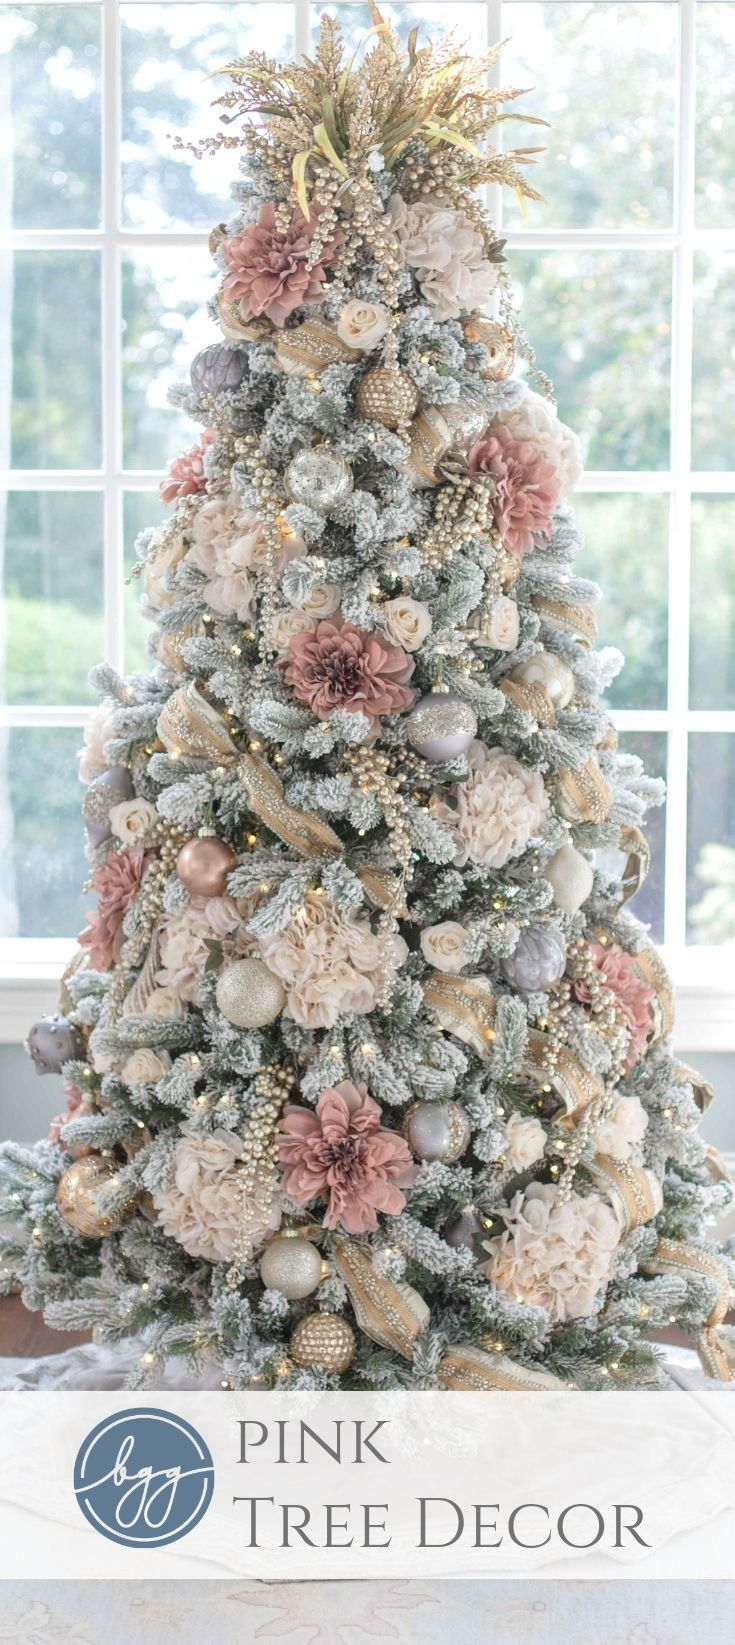 Pink Christmas Tree with Gold Decor -   17 christmas tree decor 2020 pink ideas